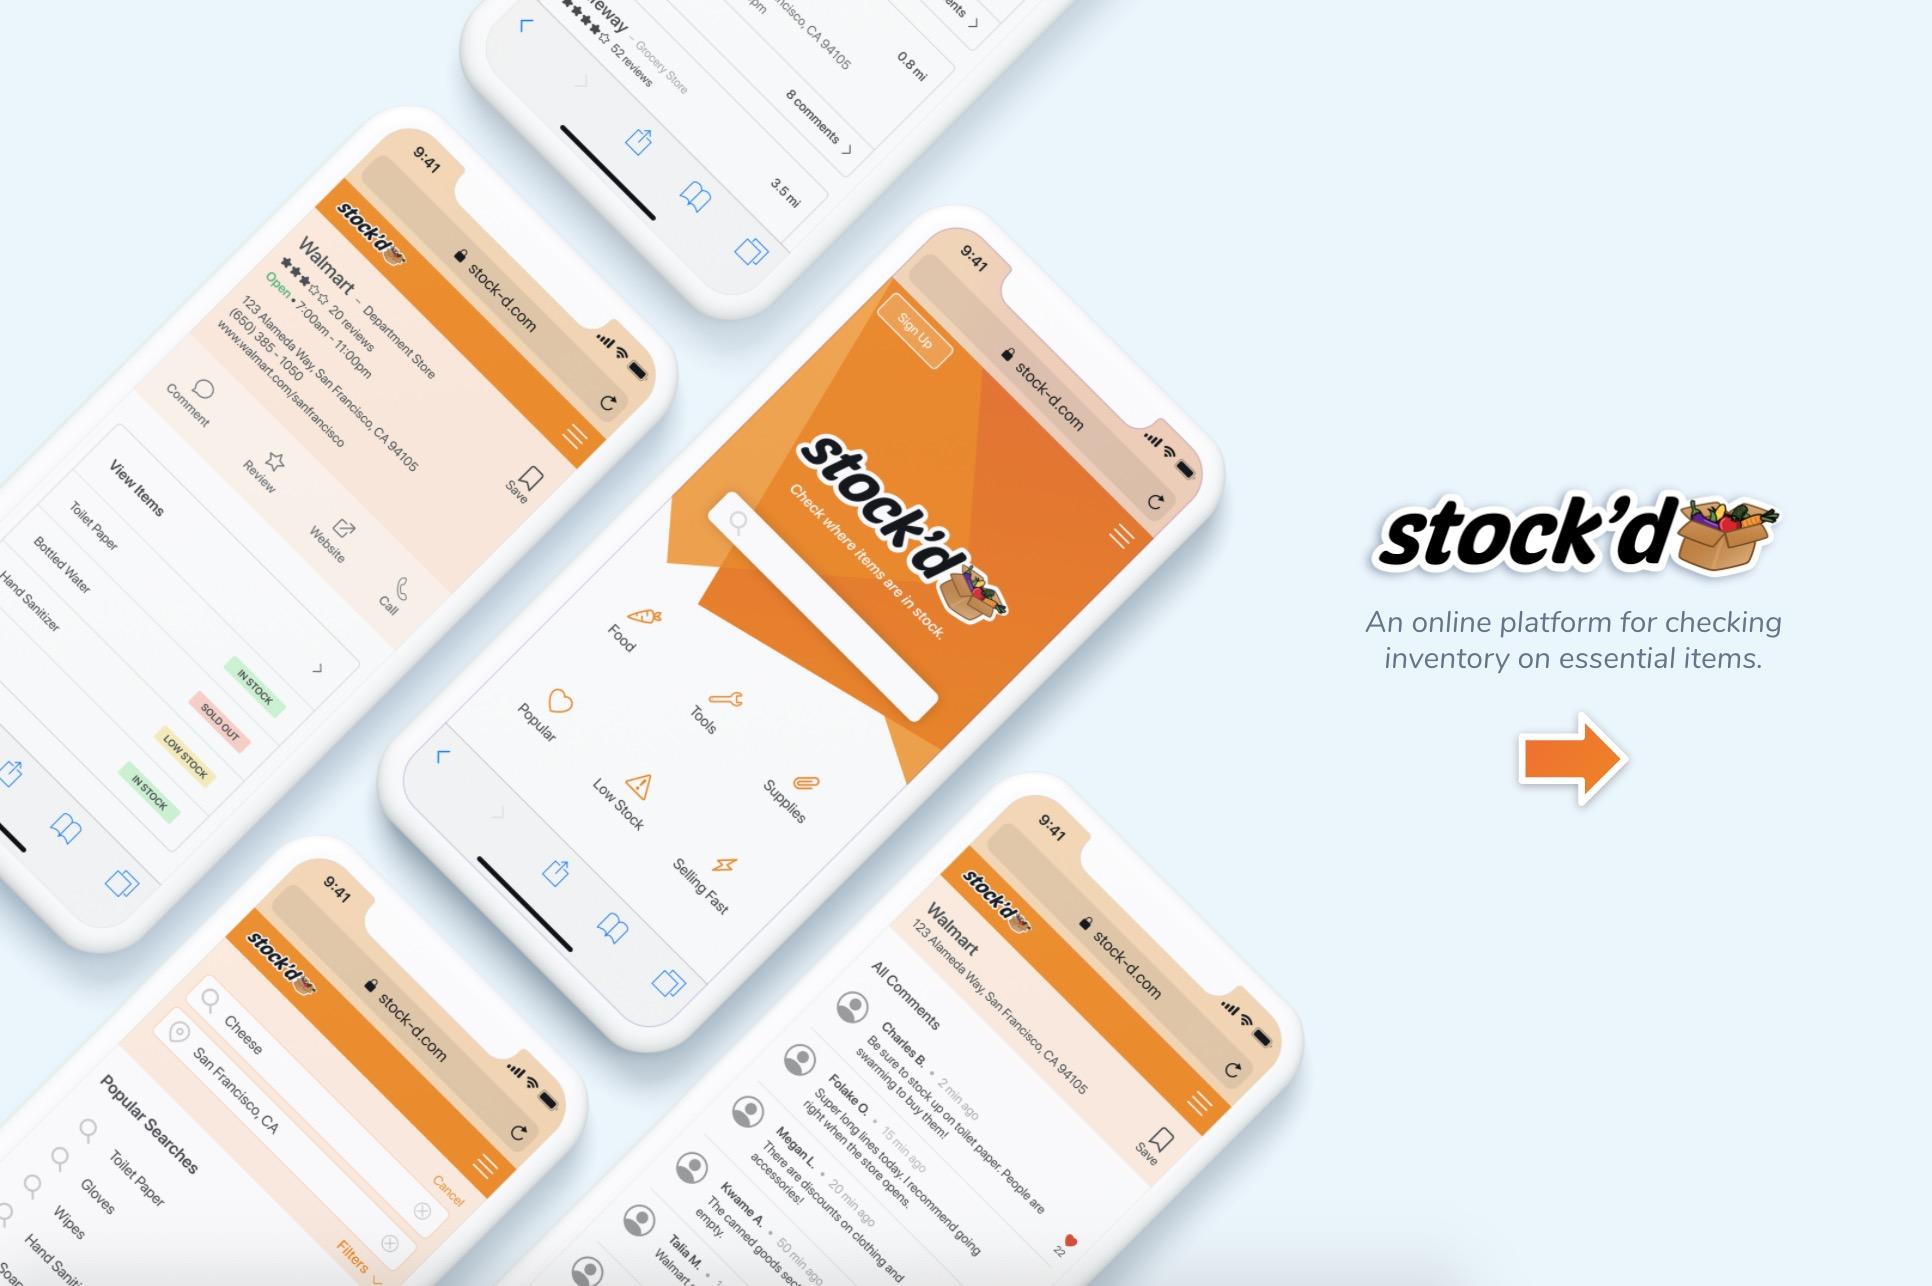 Stock'd